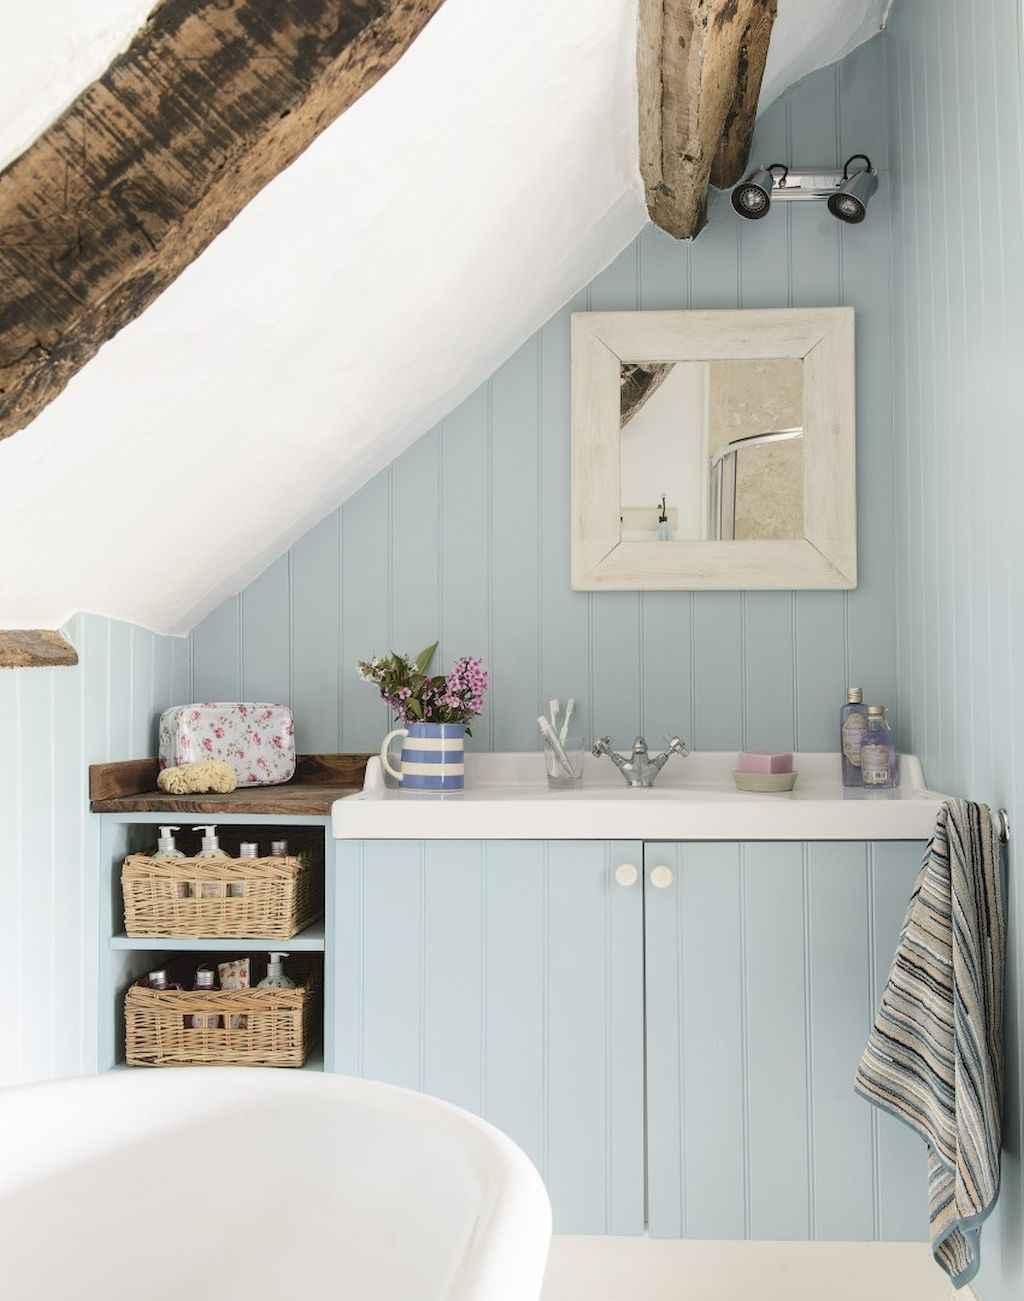 Attic Bathroom Makeover Ideas On A Budget 24 Homespecially